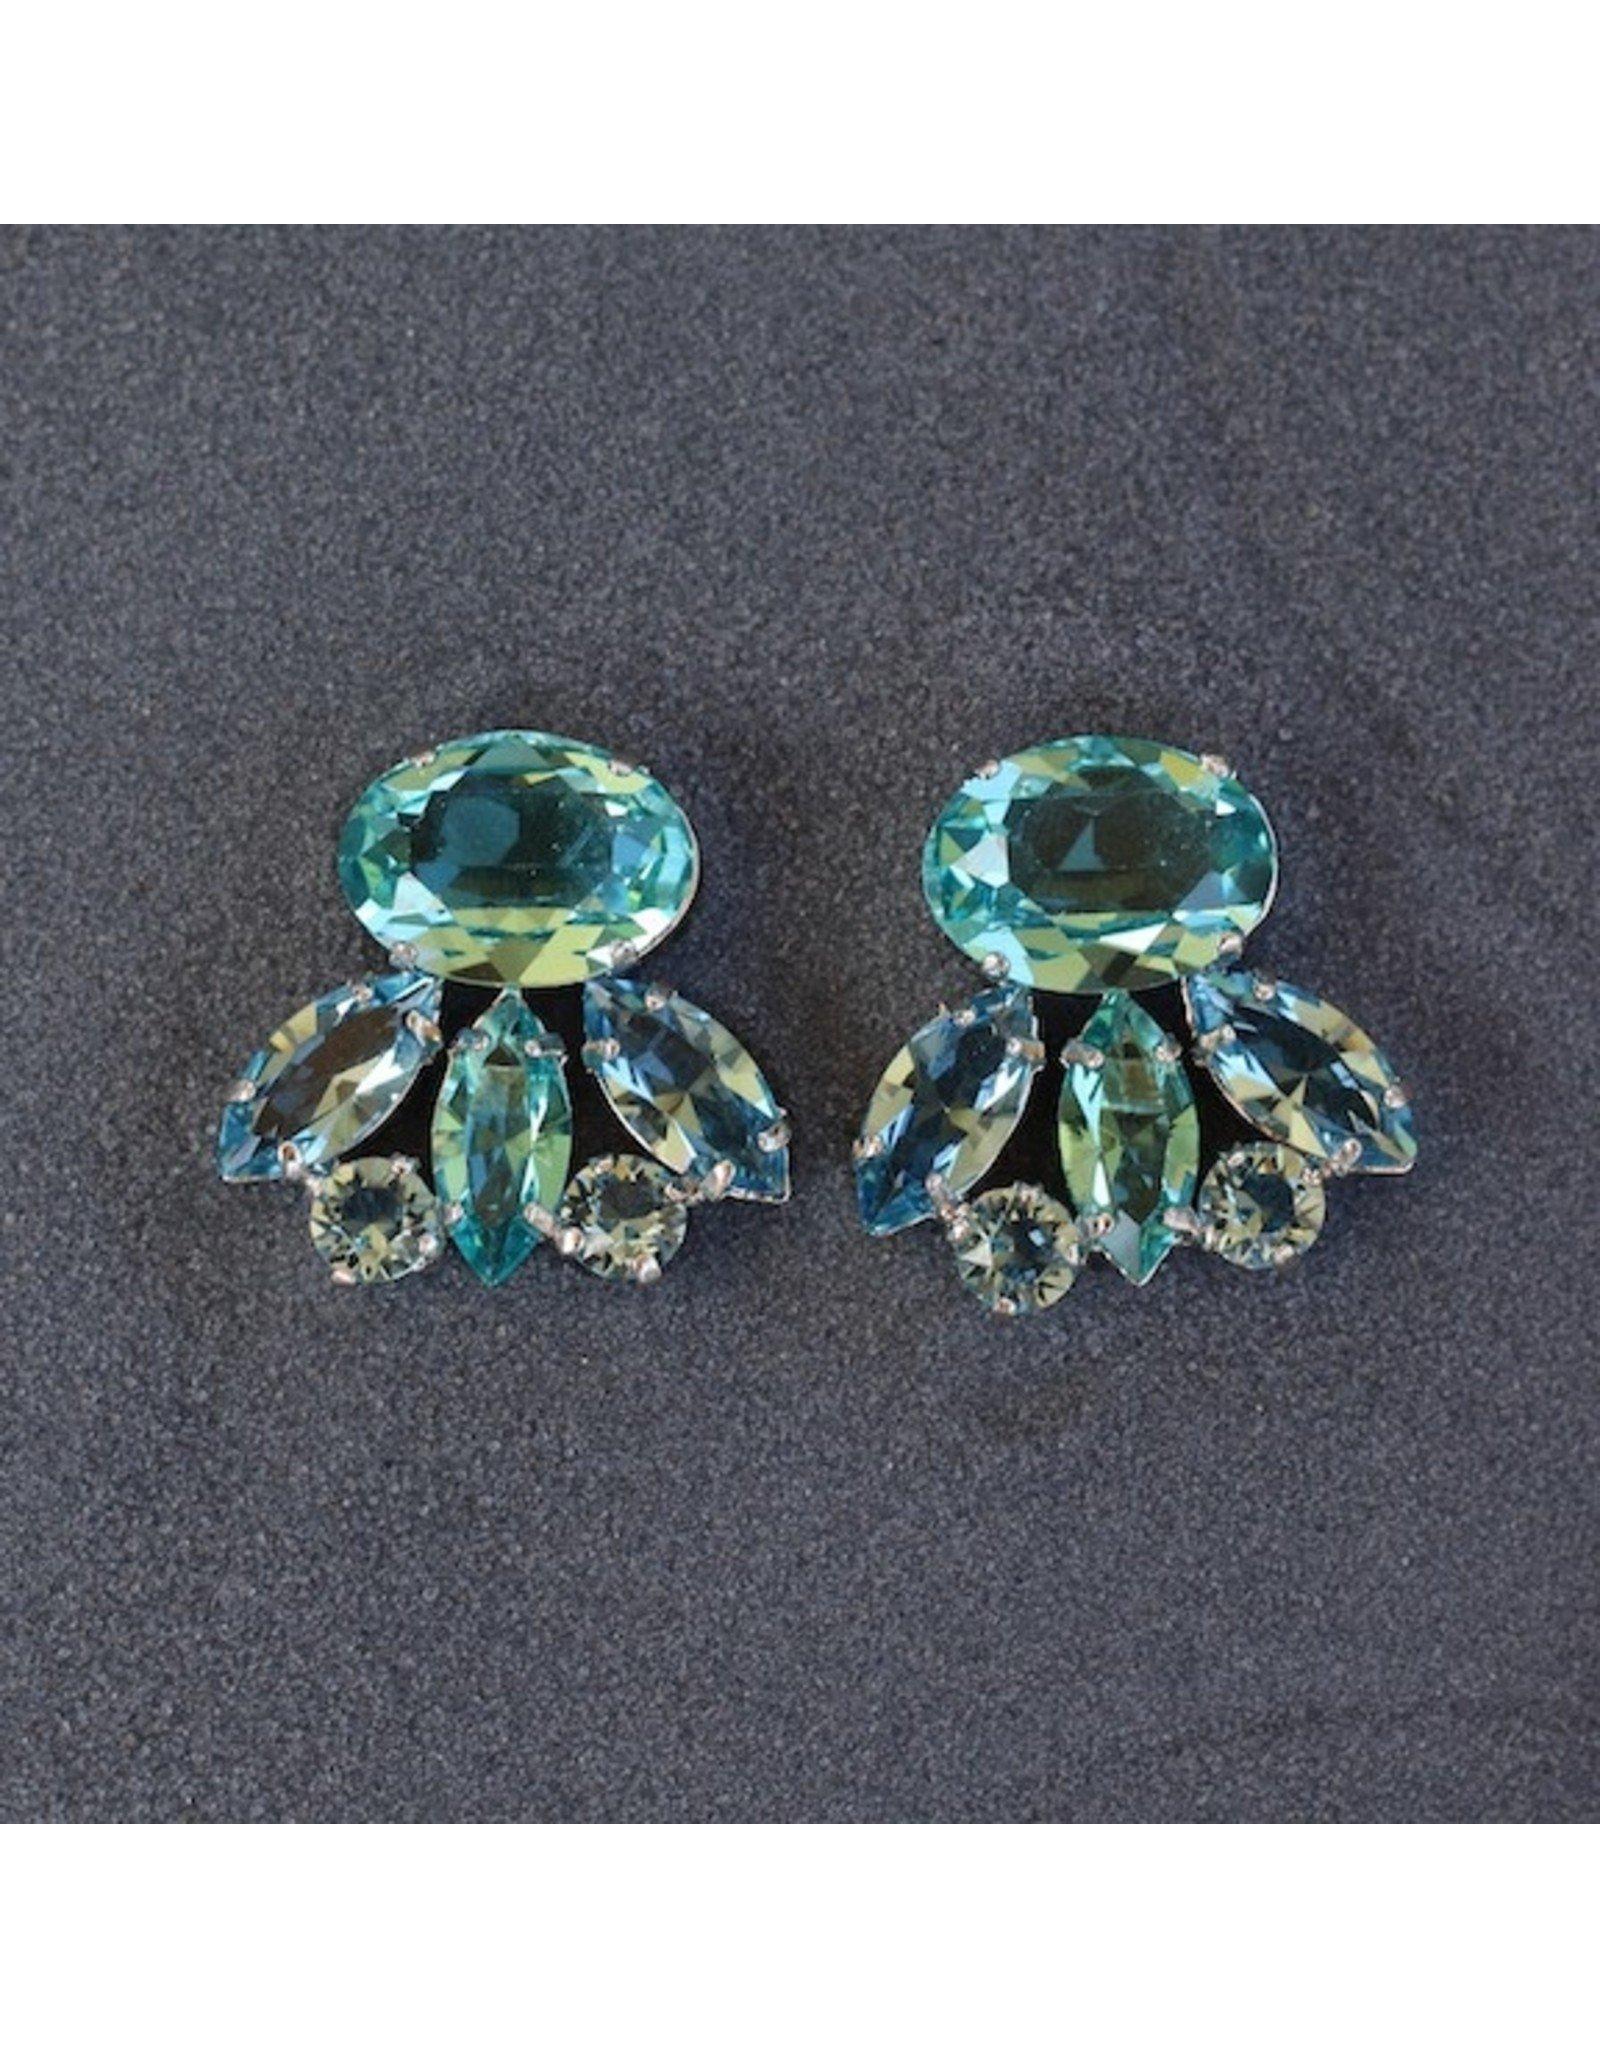 Philippe Ferrandis Aqua and Silver Clip on Earring